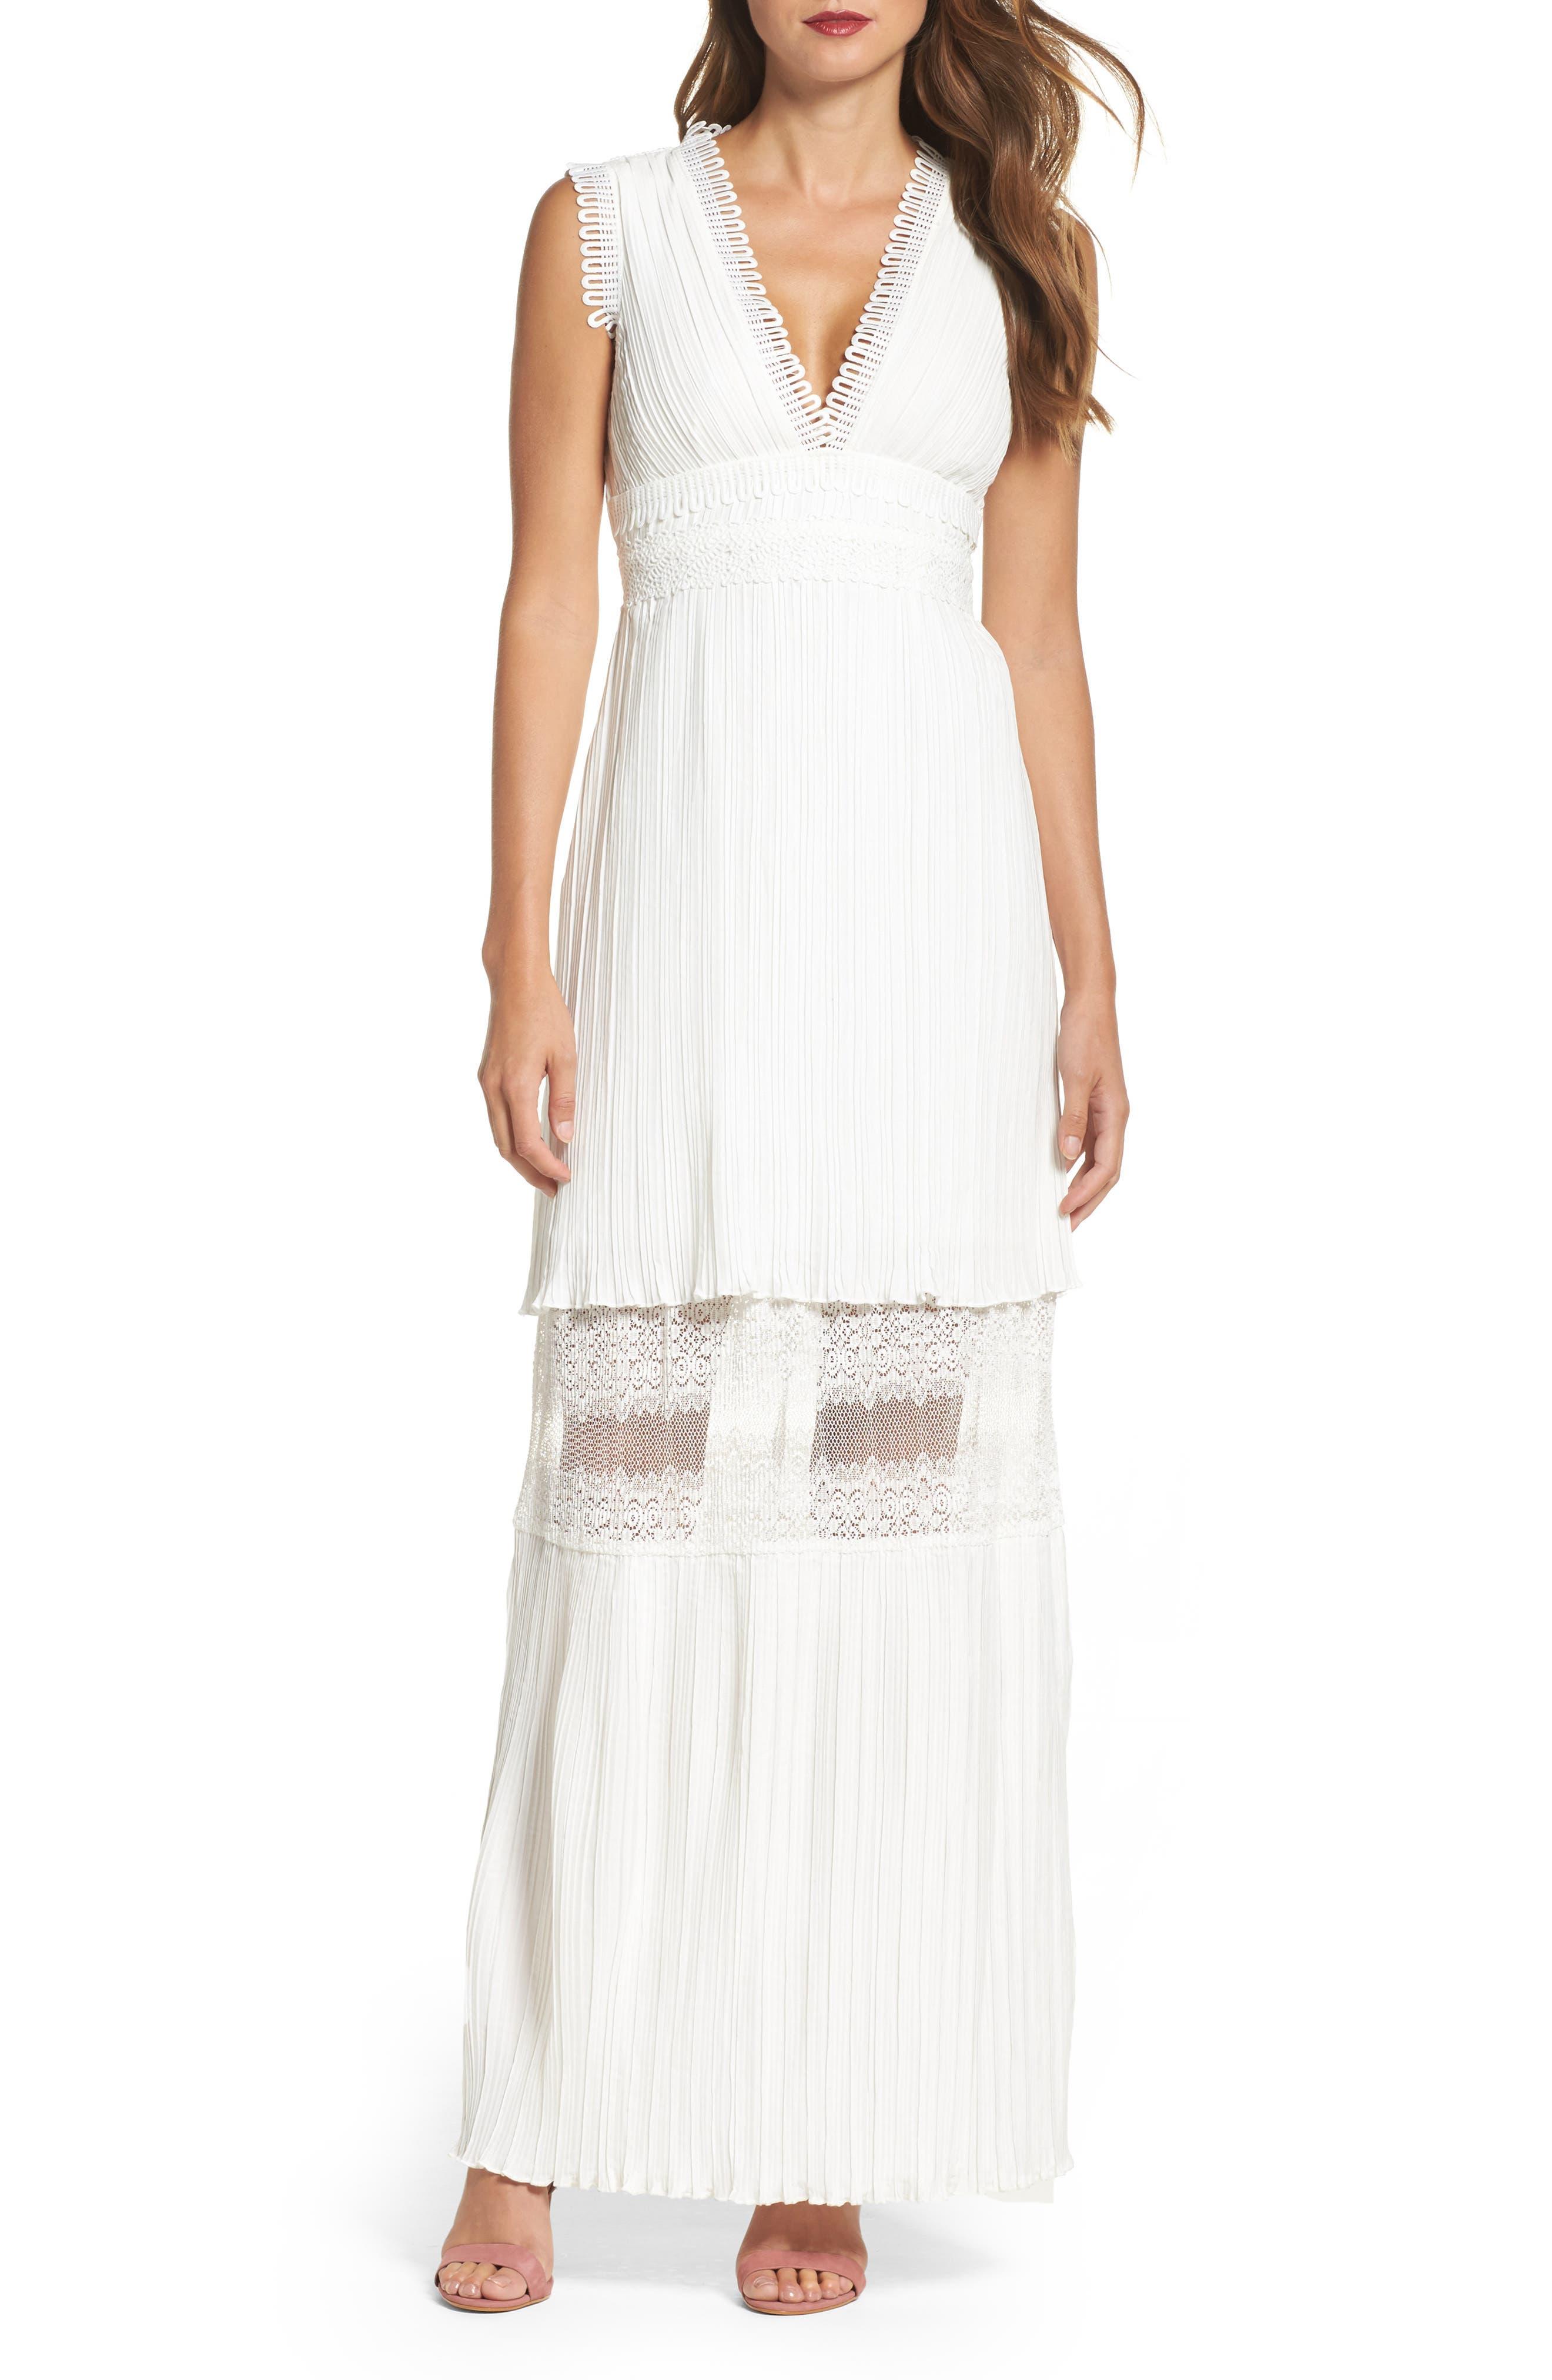 Foxiedox Jasmine Lace Inset Pleated Dress